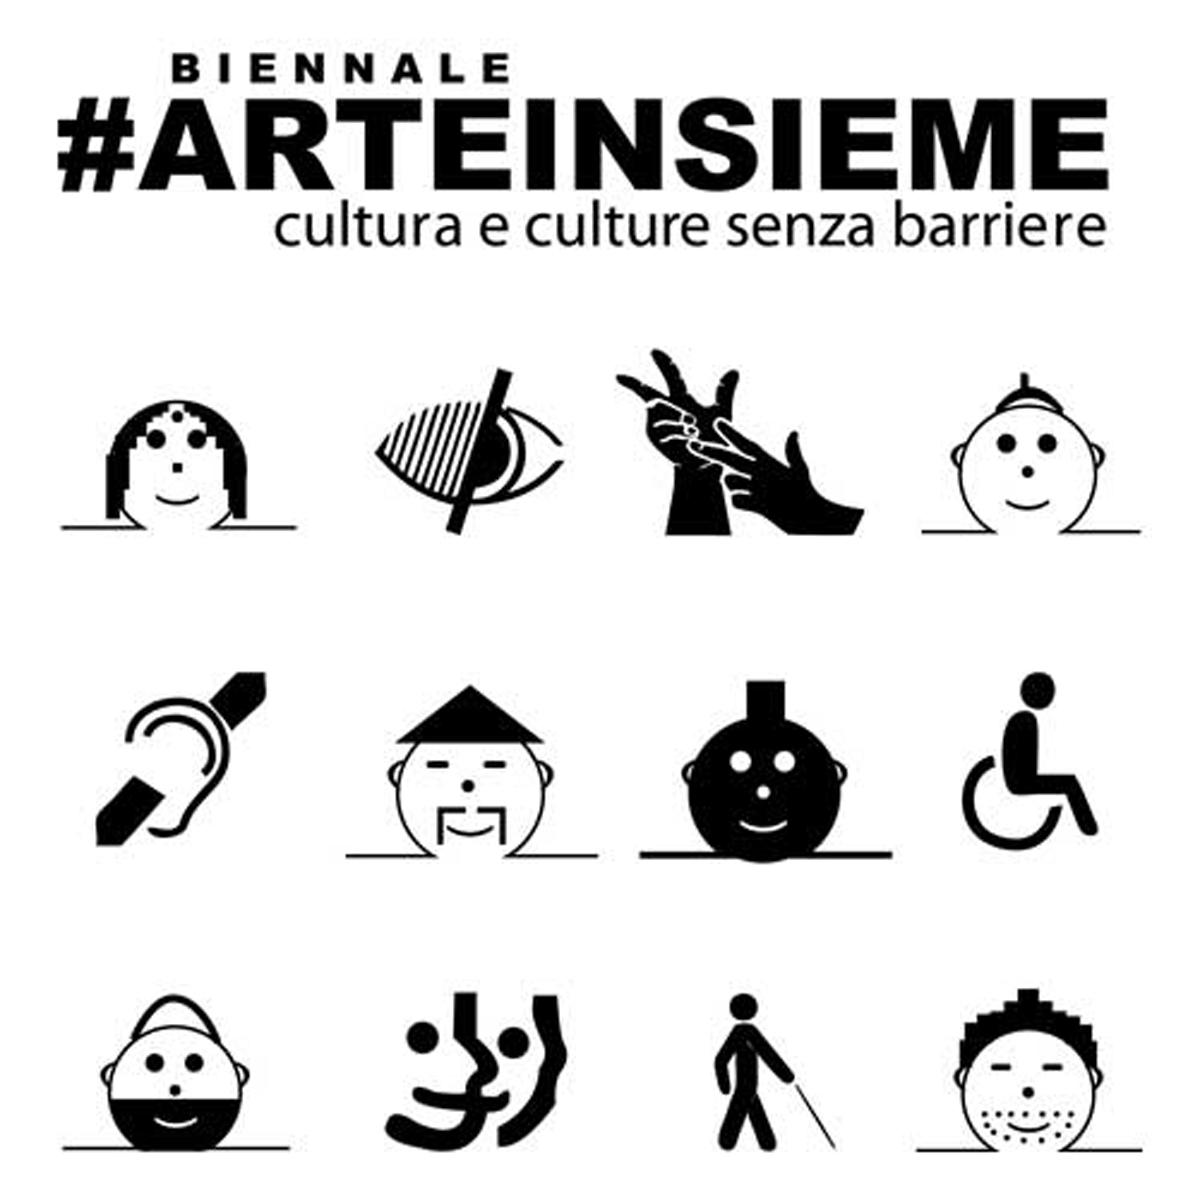 logo biennale arteinsieme